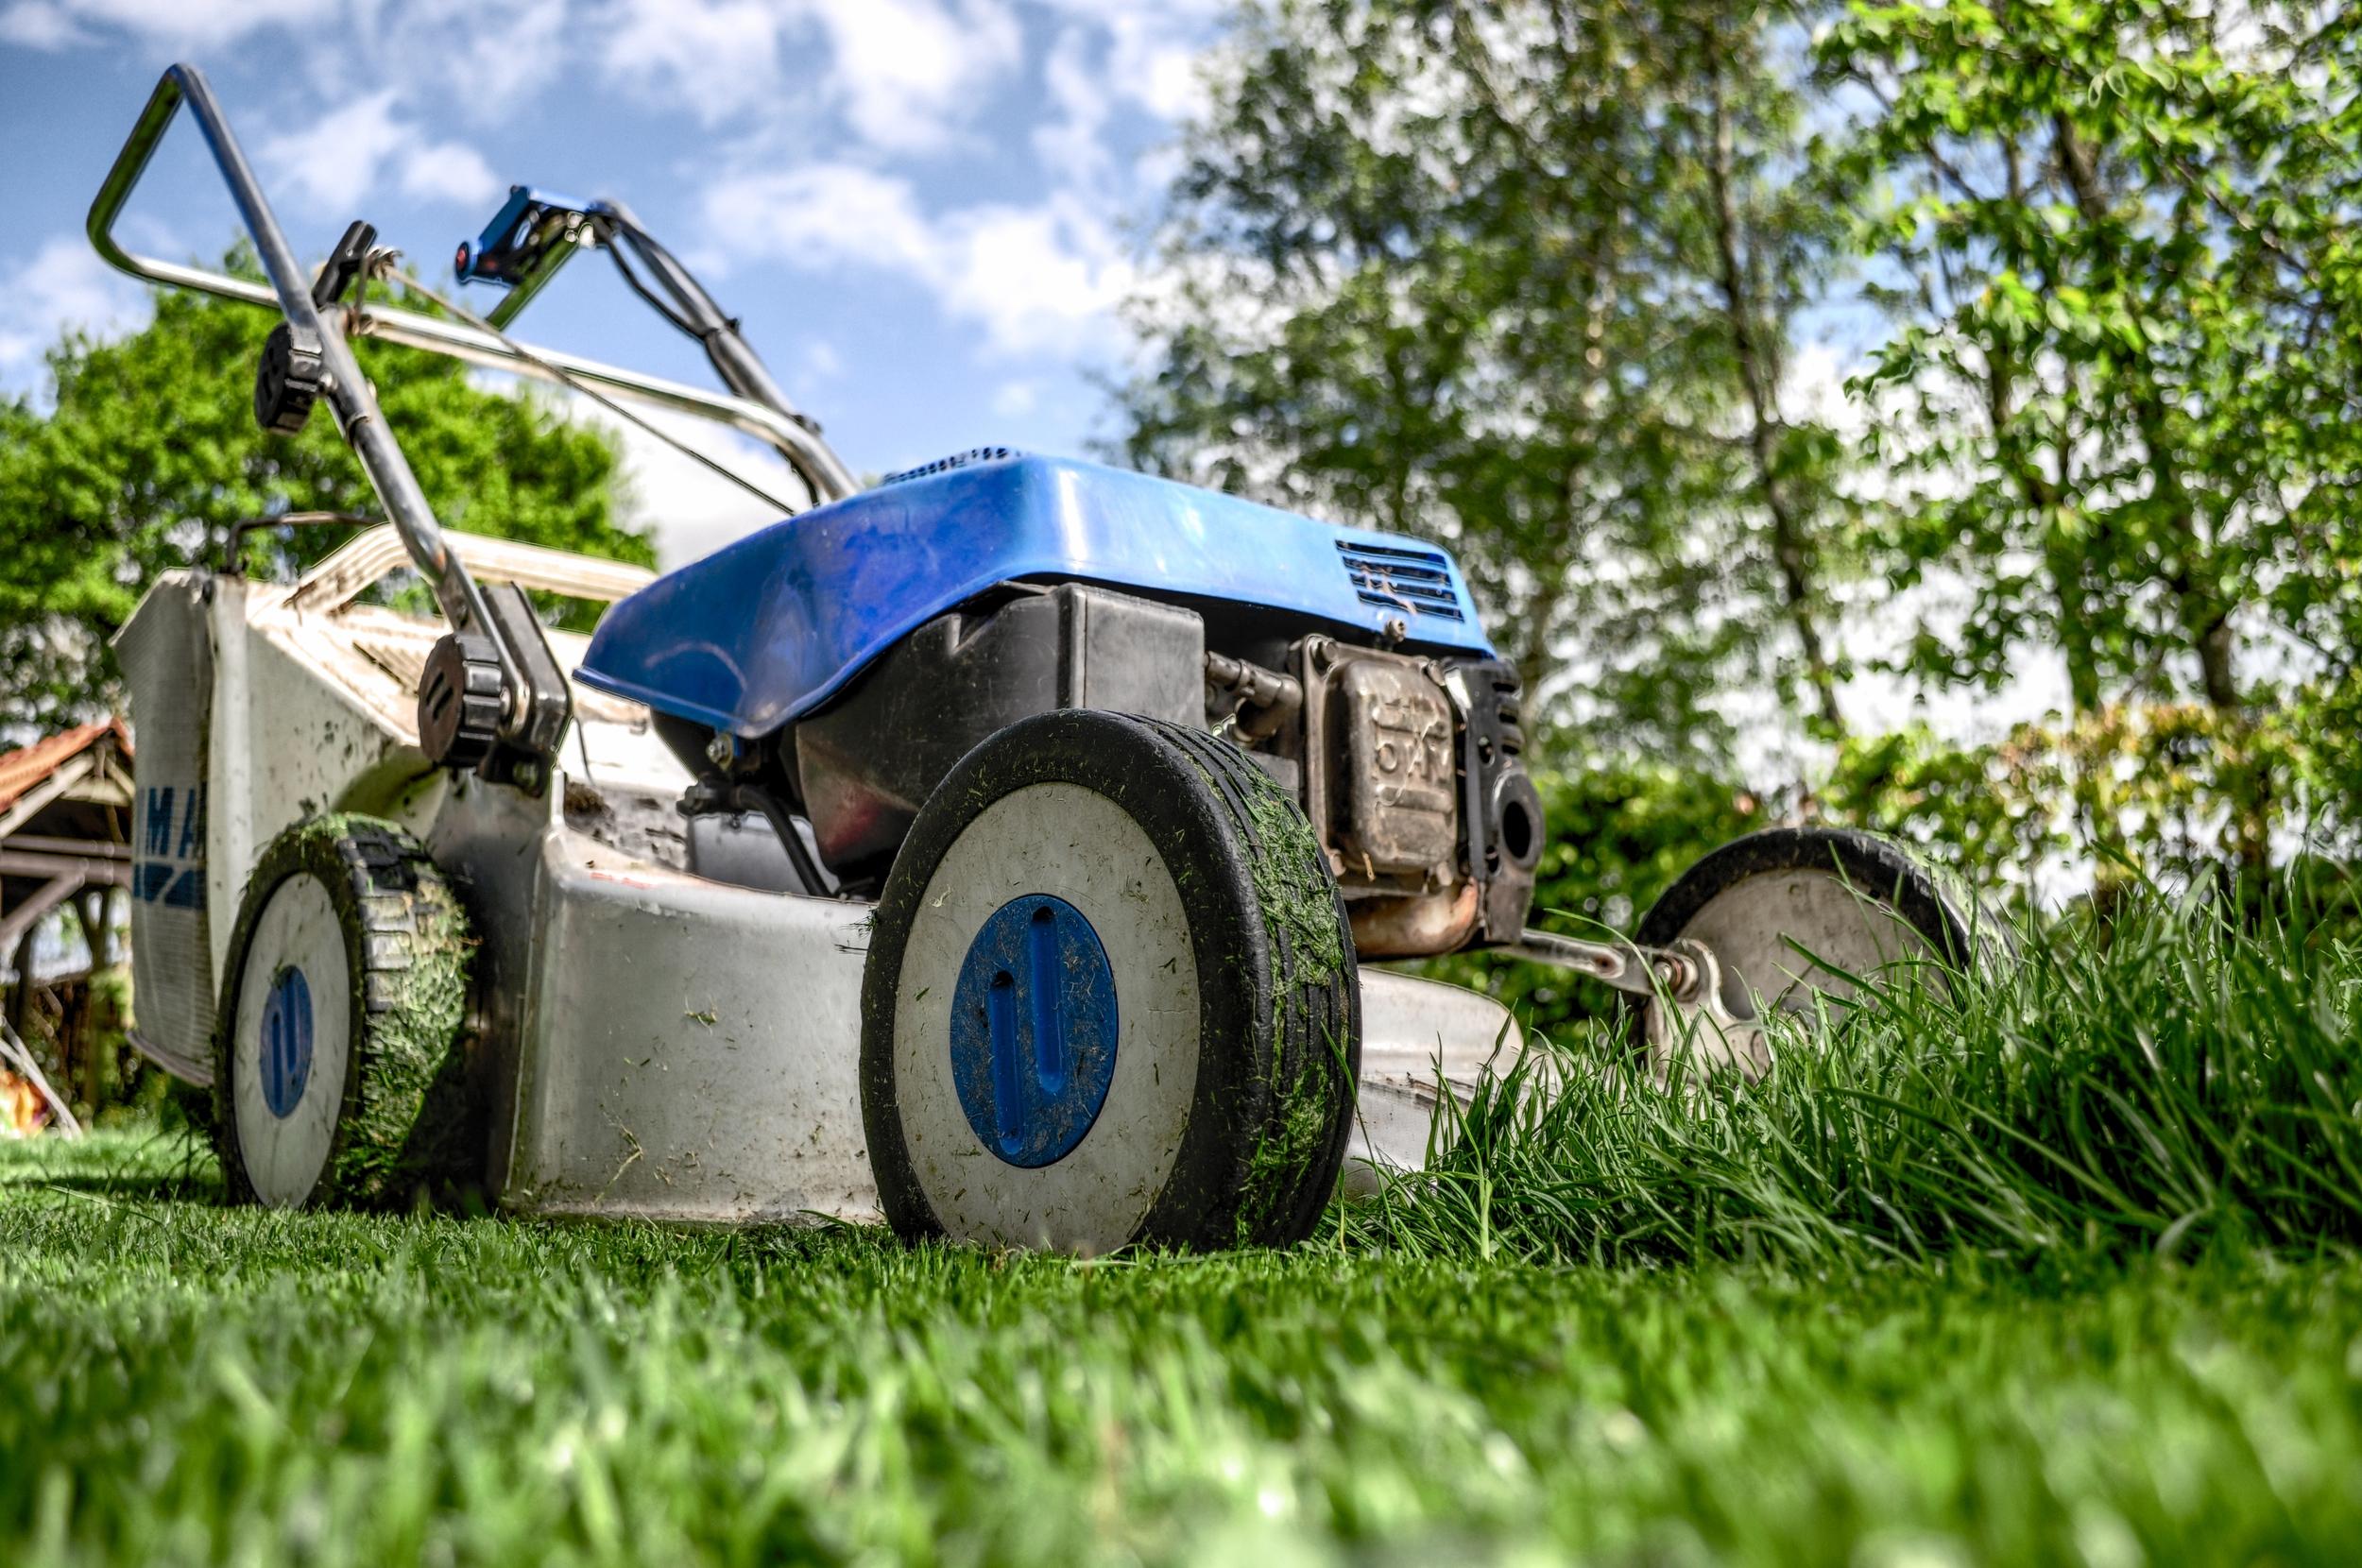 garden-gardening-grass-589.jpg